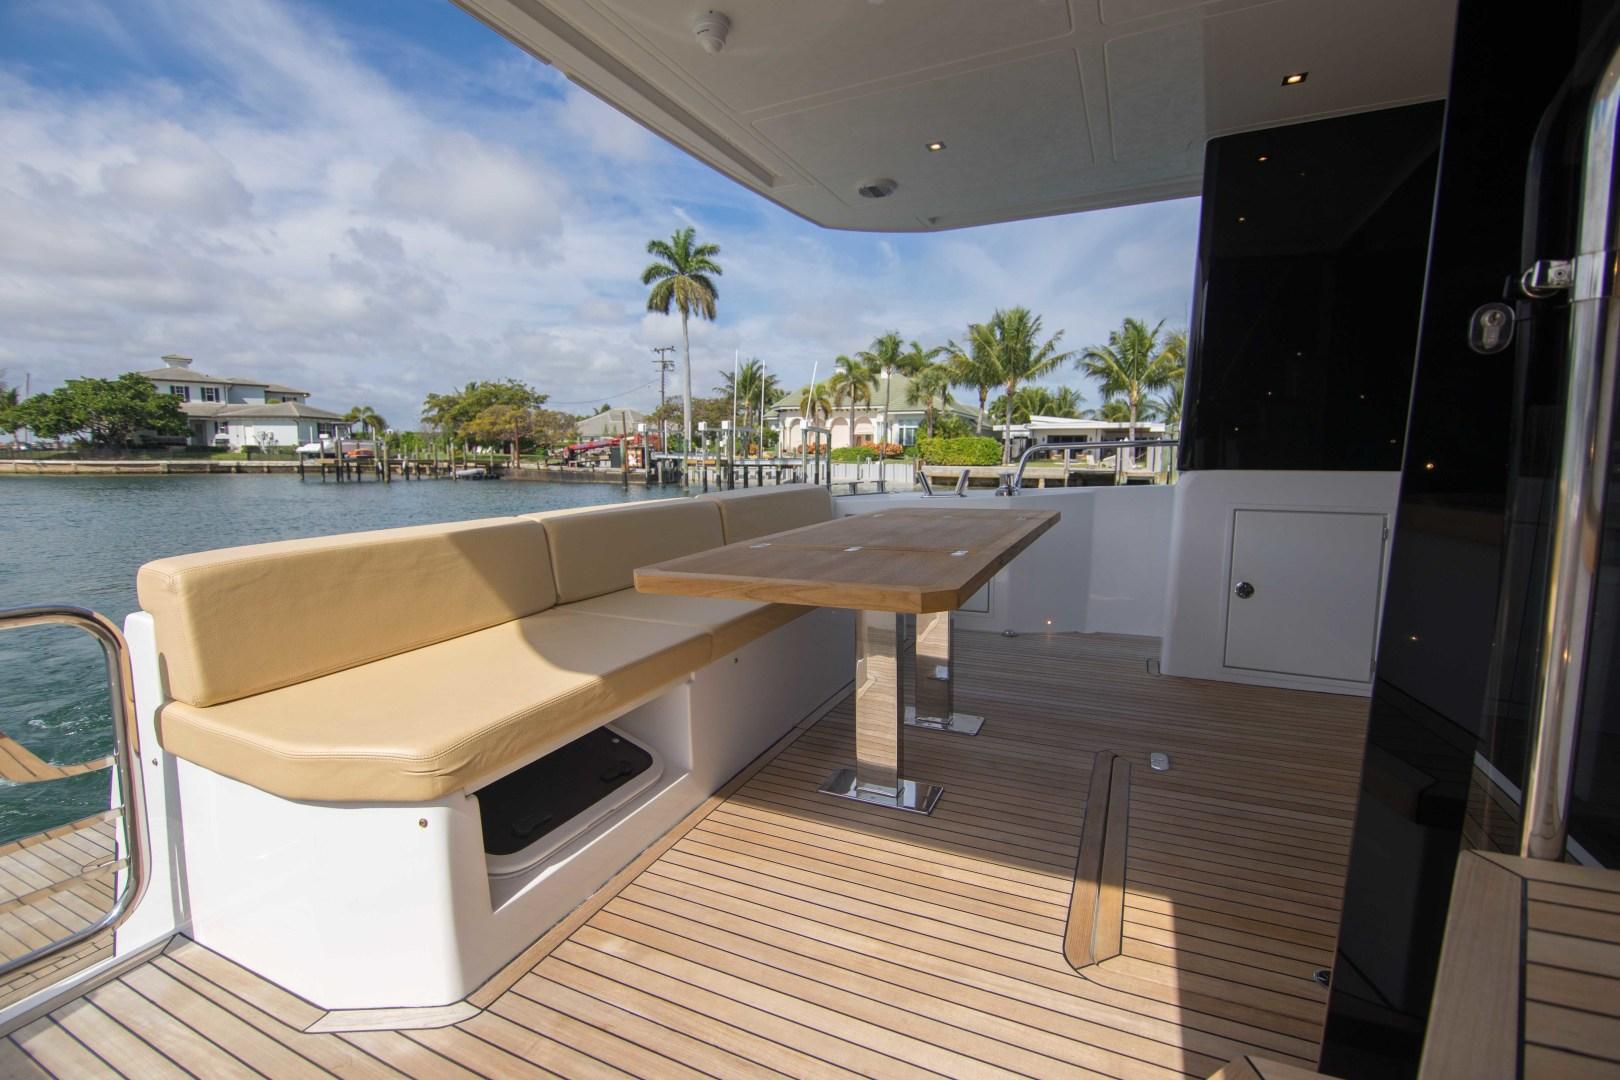 Sundeck-58 Sport 2019-LJ IV Singer Island-Florida-United States-Aft Deck-1373066 | Thumbnail